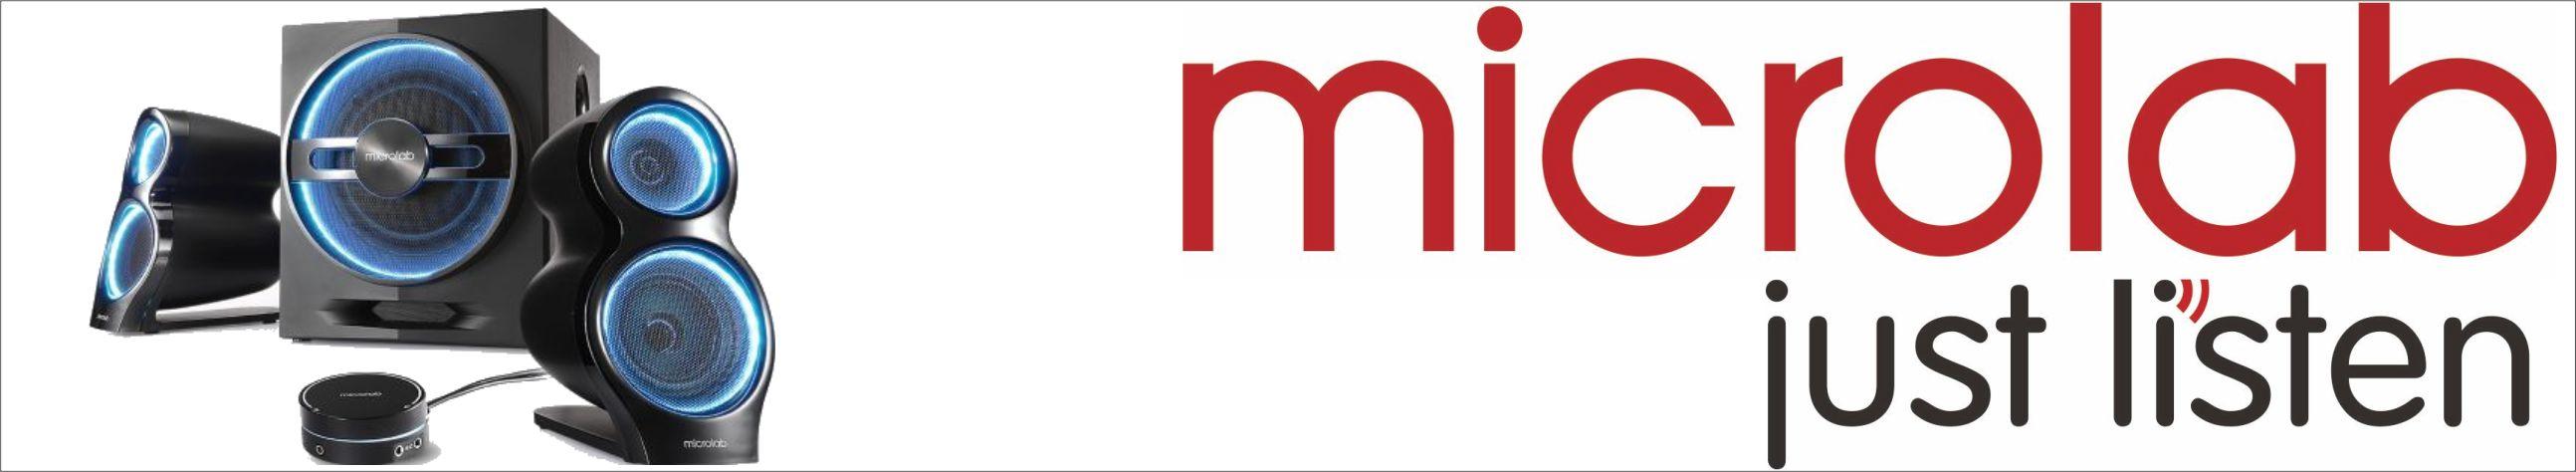 Microlab NEW